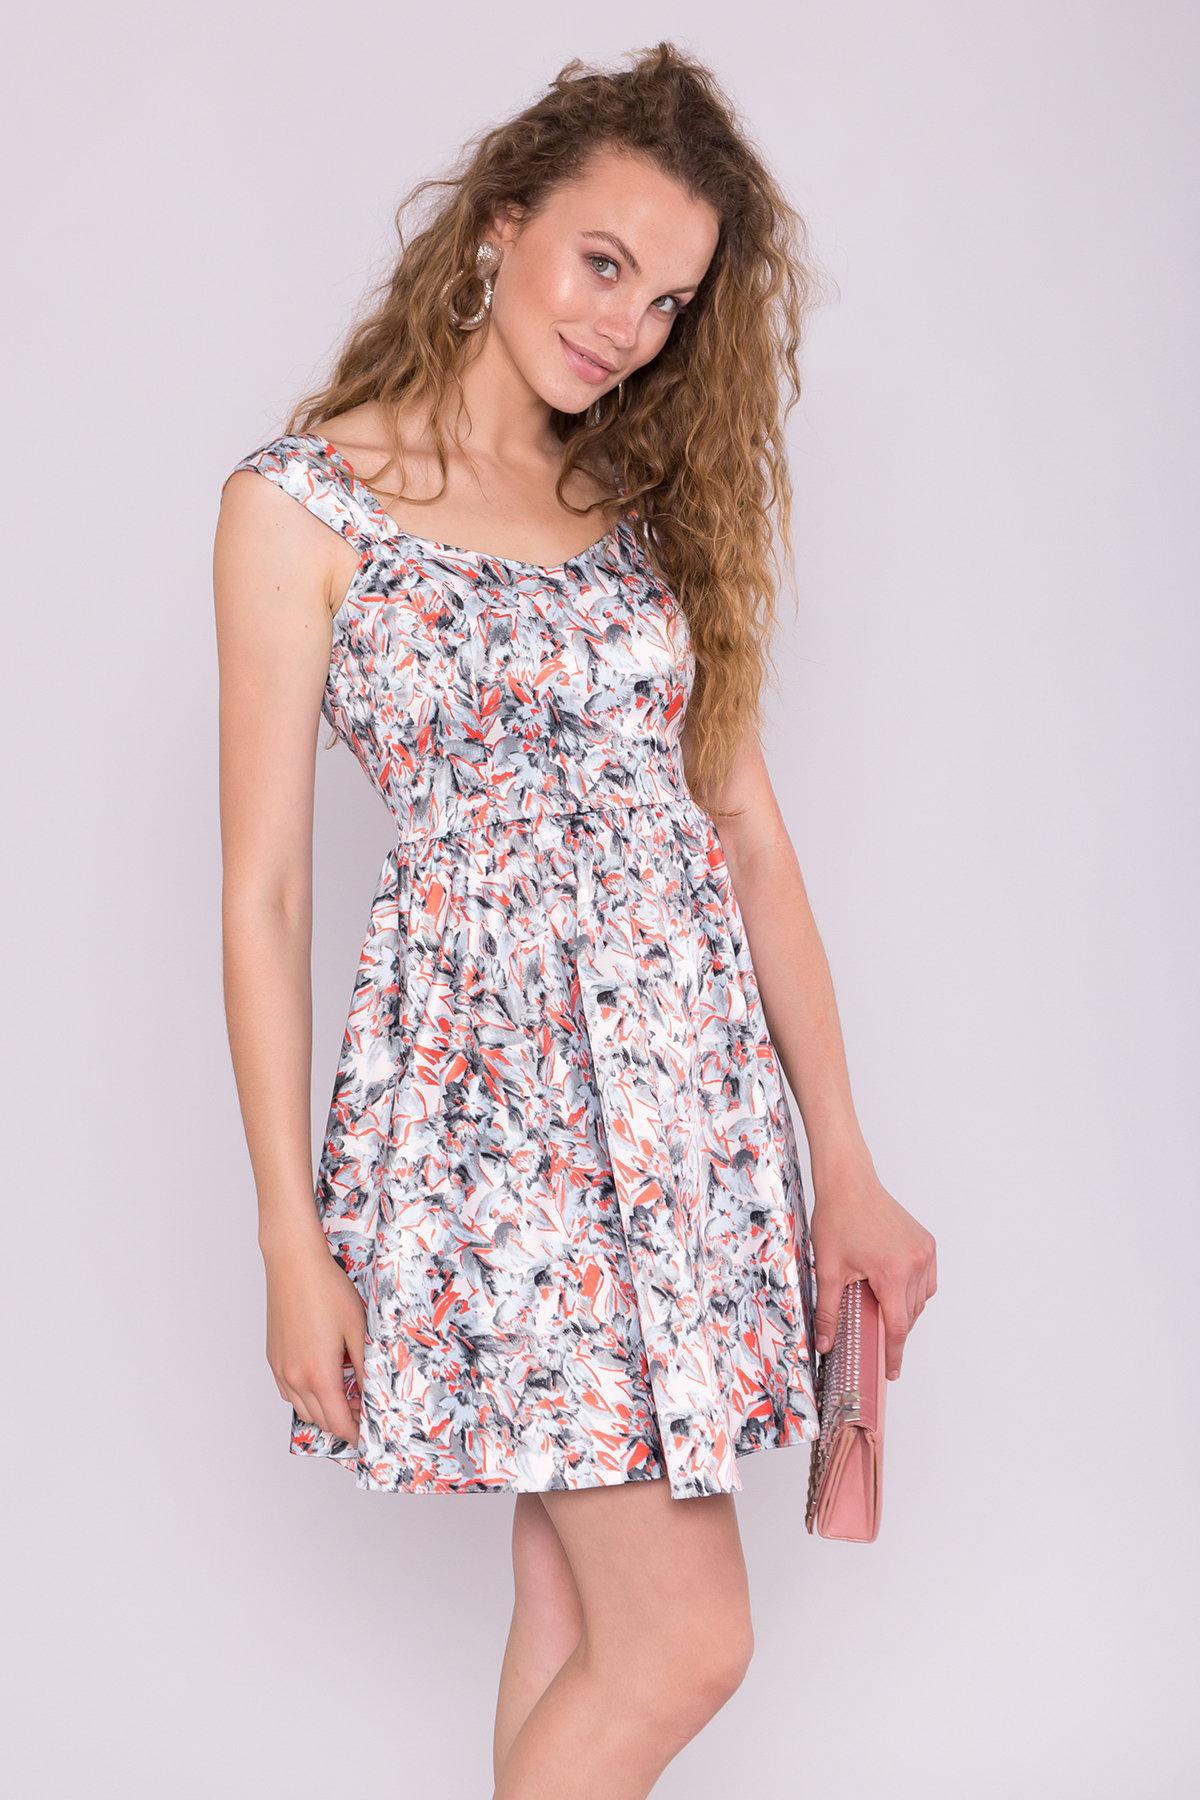 Платье Луиджи 7144 АРТ. 42845 Цвет: голубой/кораллл - фото 3, интернет магазин tm-modus.ru